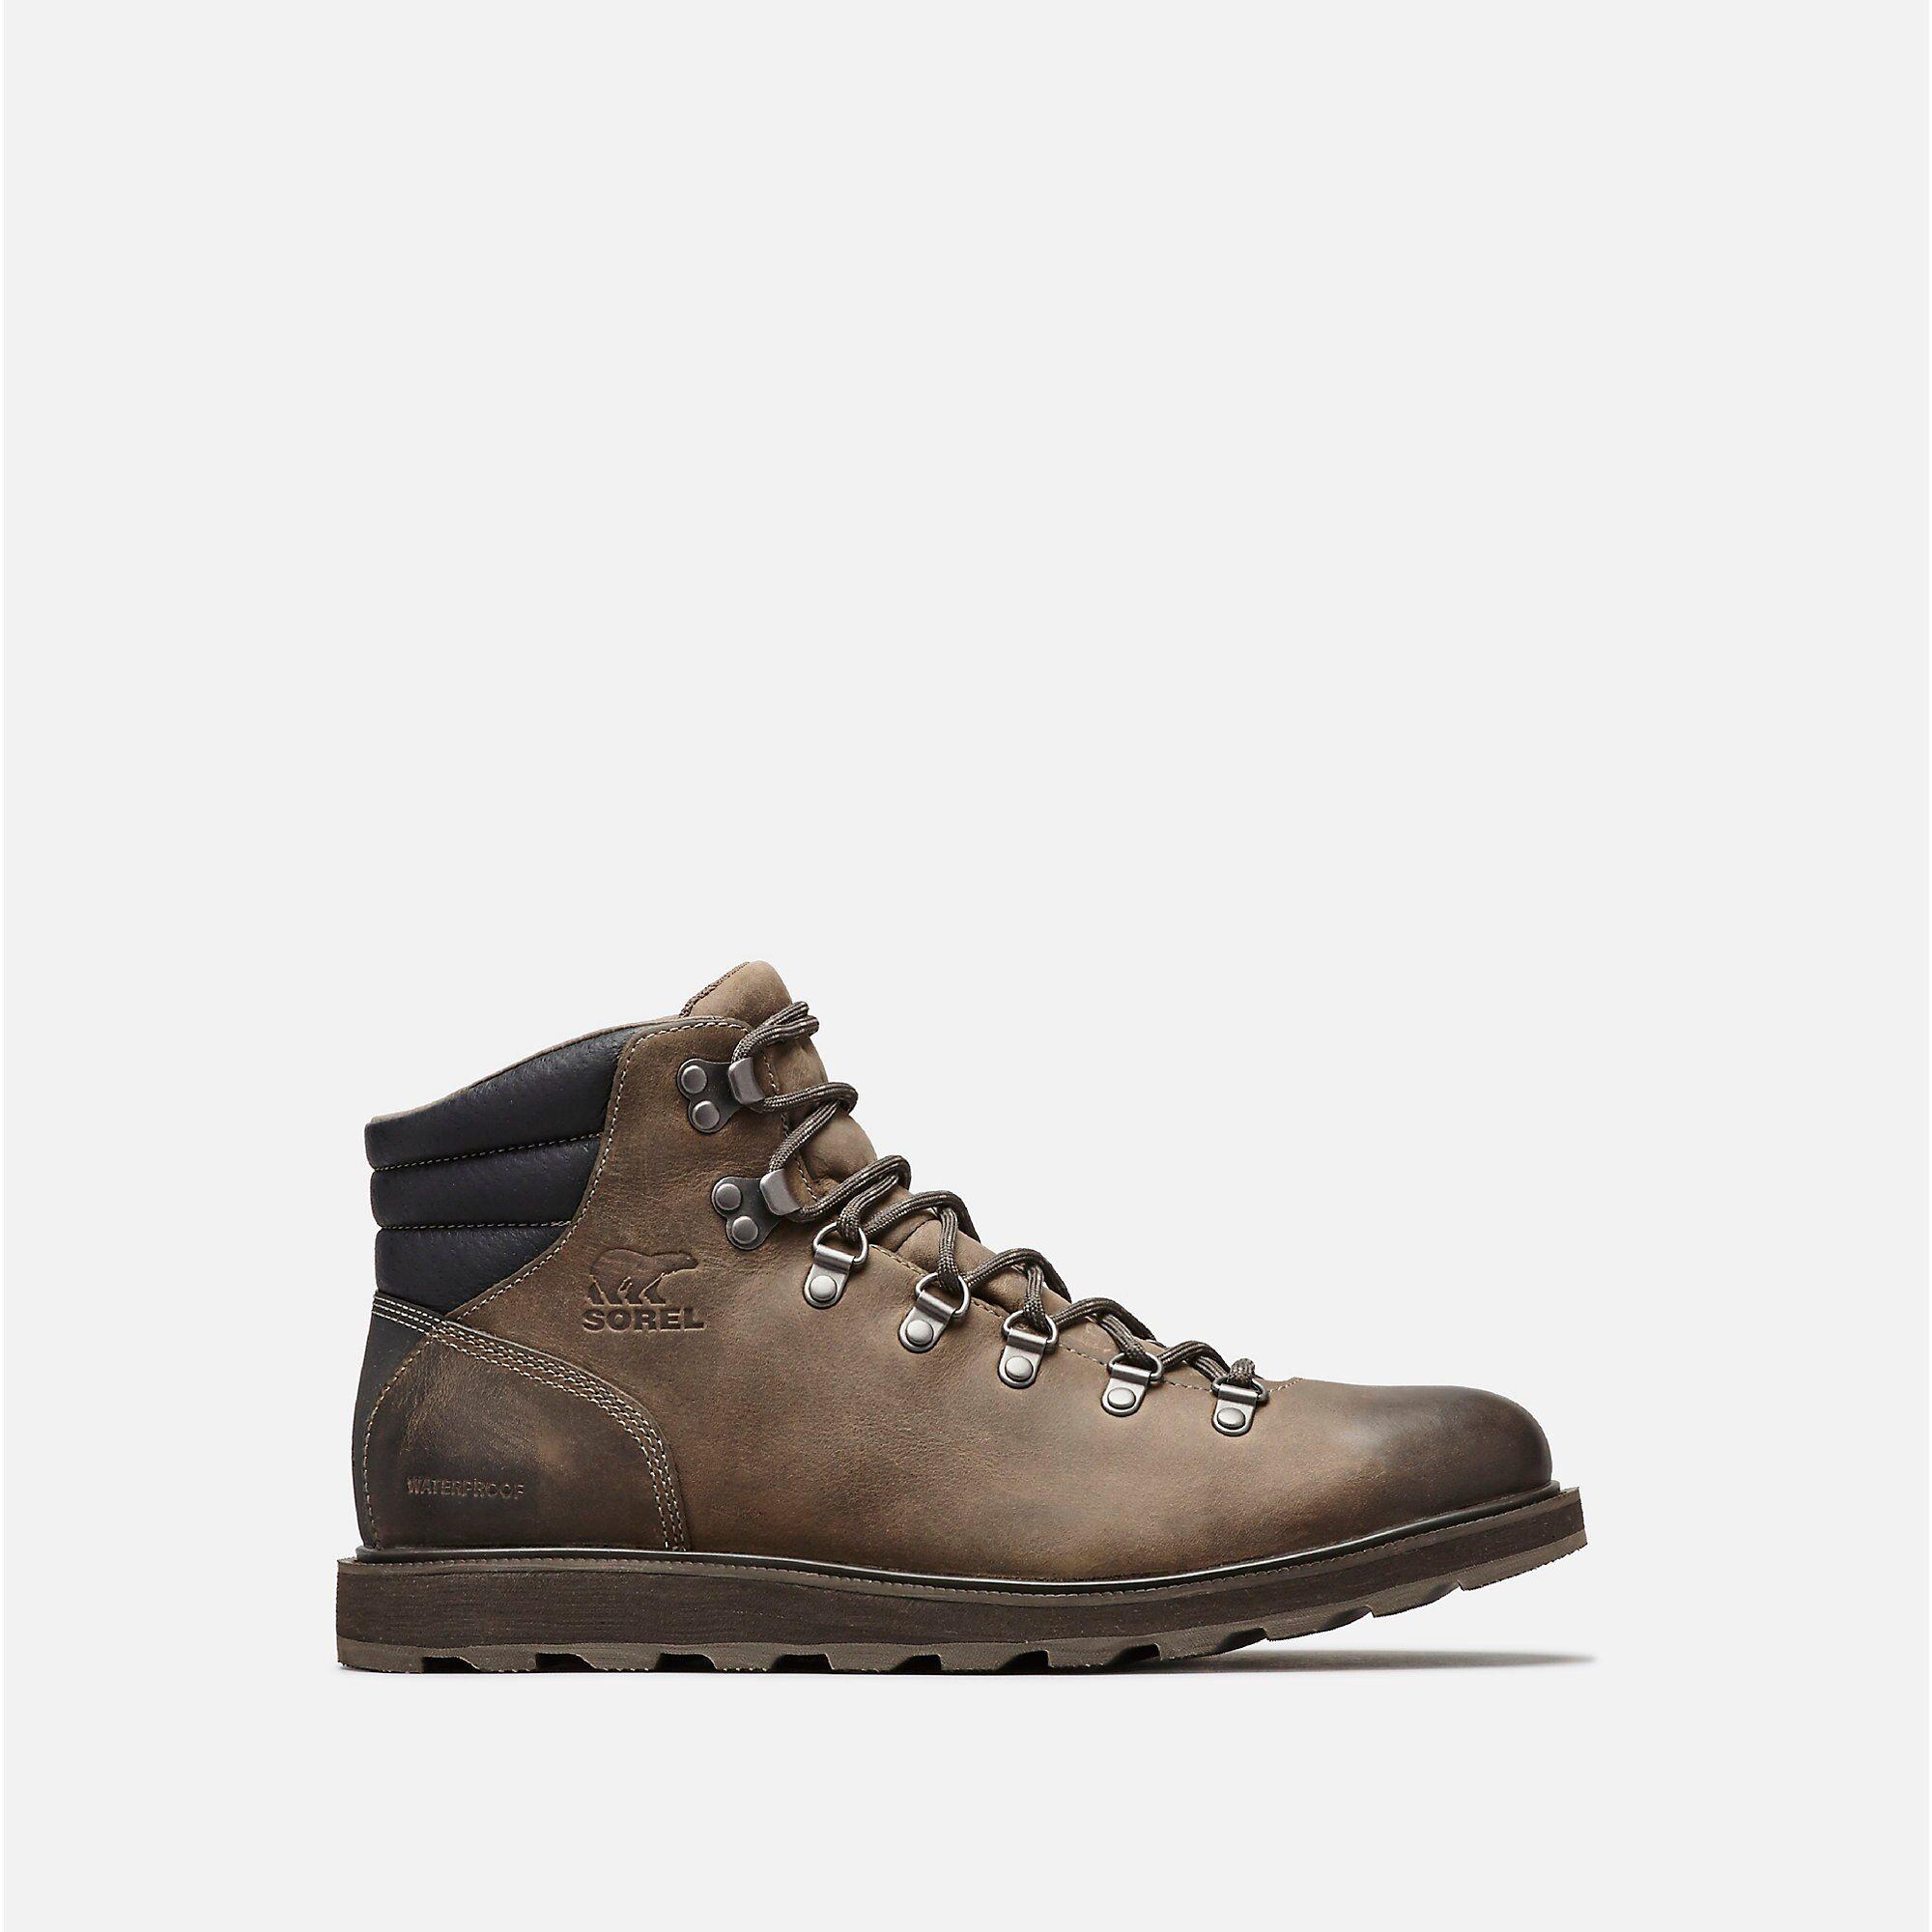 Madson™ hiker waterproof | 245 | 11.5 in 2020 | Boots, Sorel